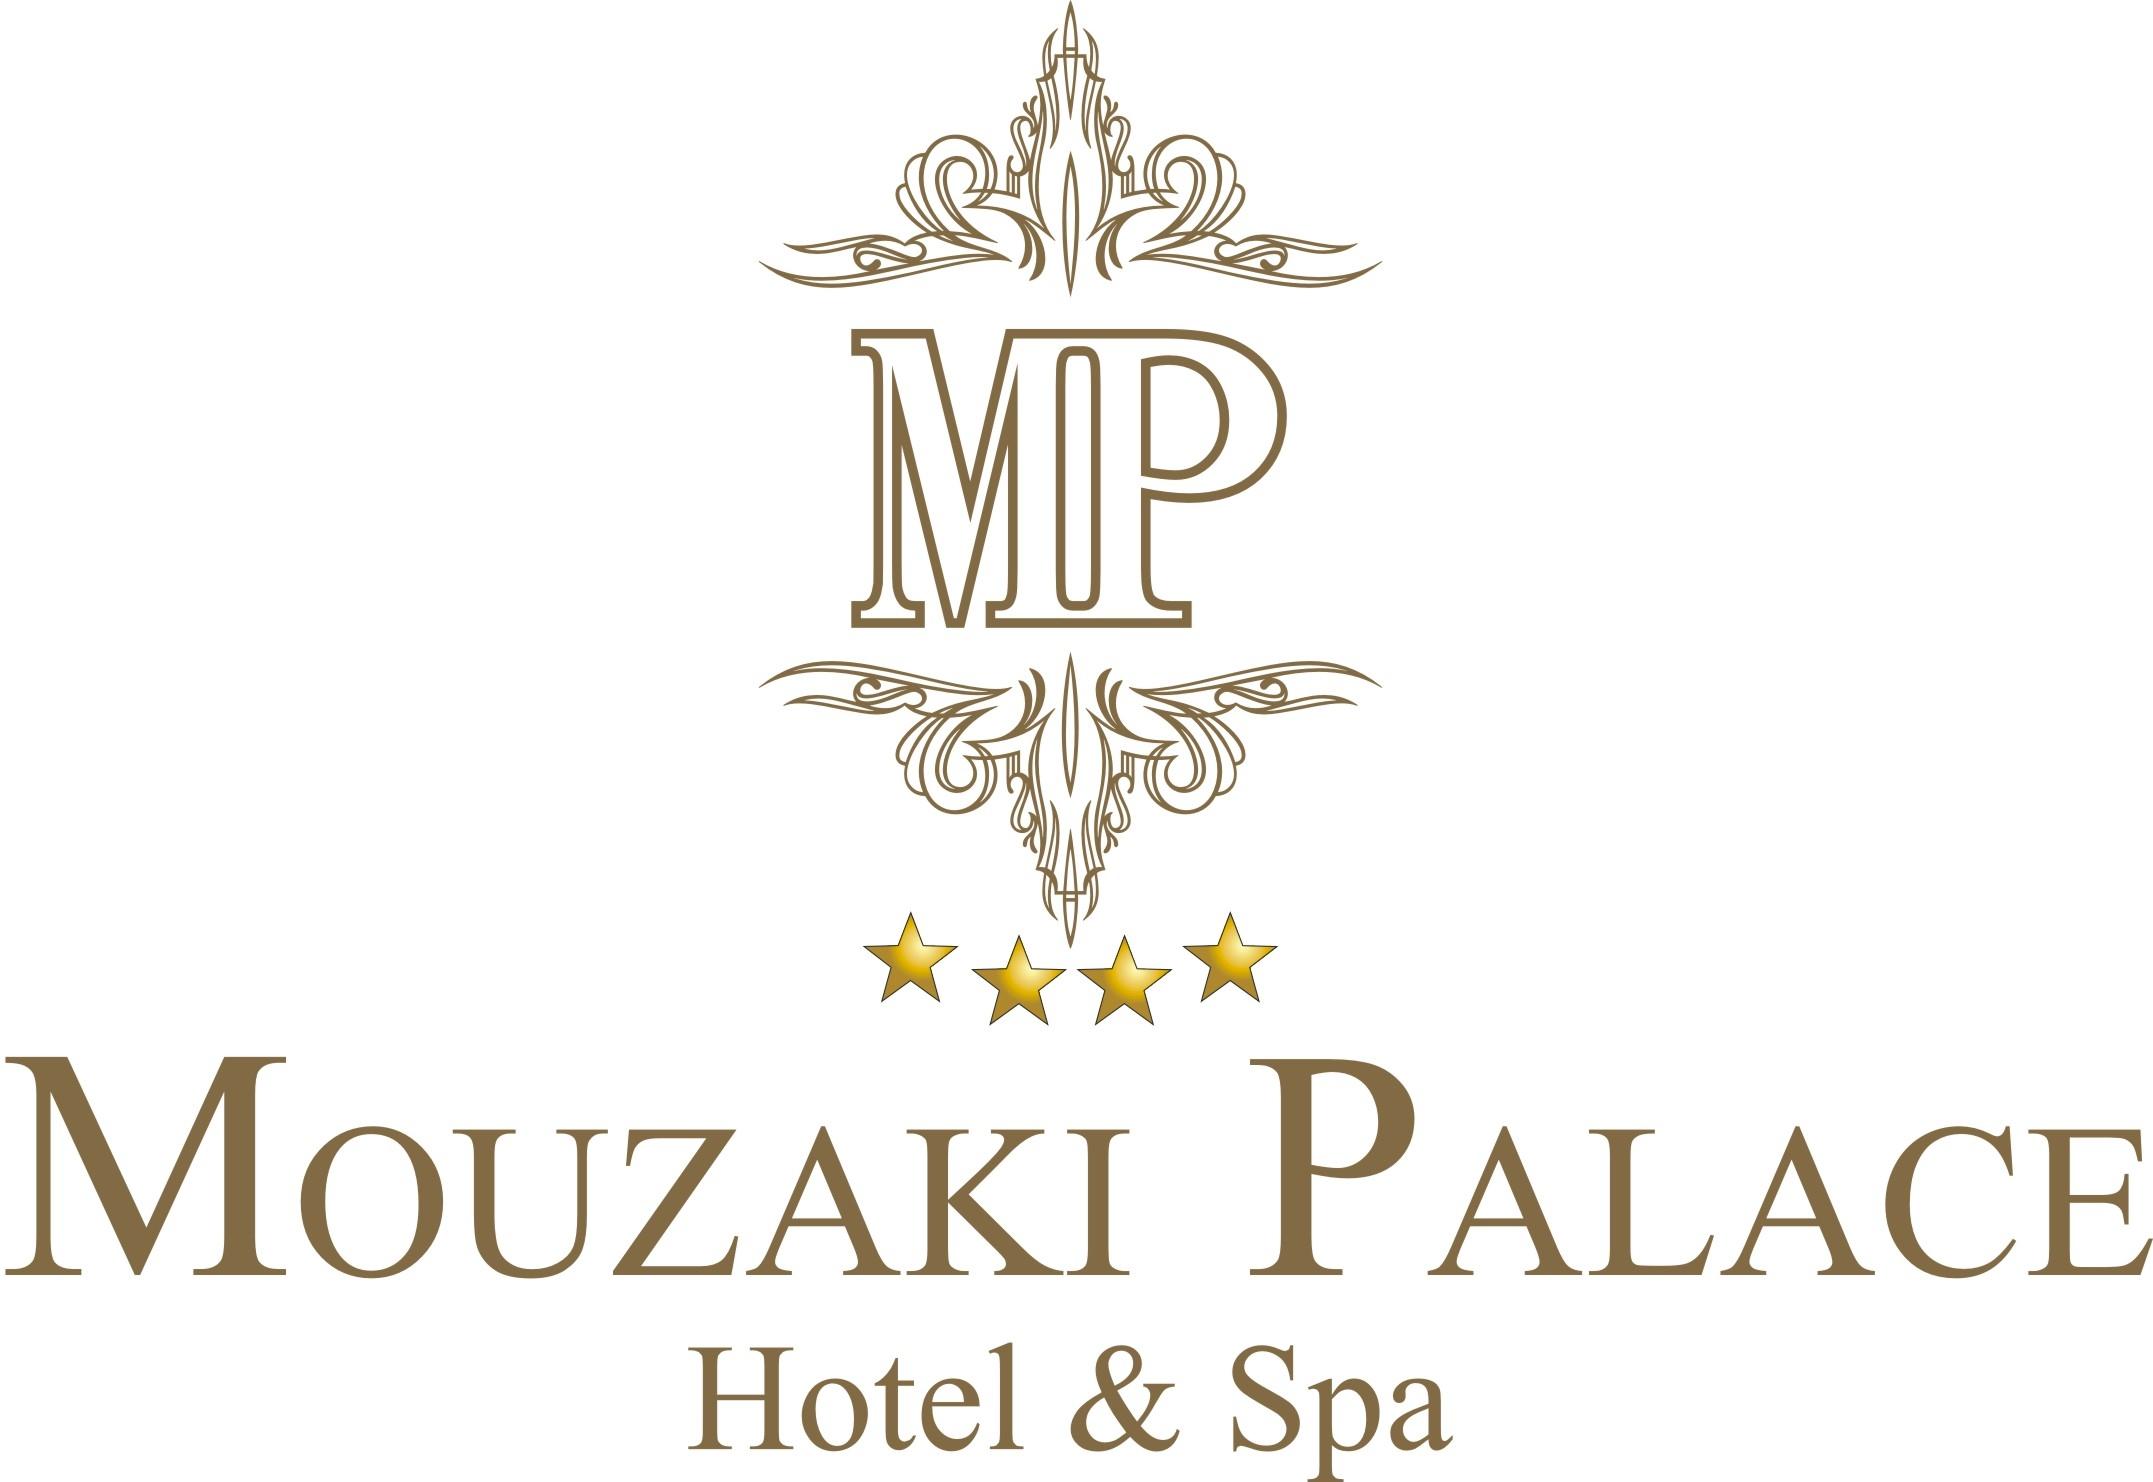 MOYZAKI PALACE HOTEL & SPA